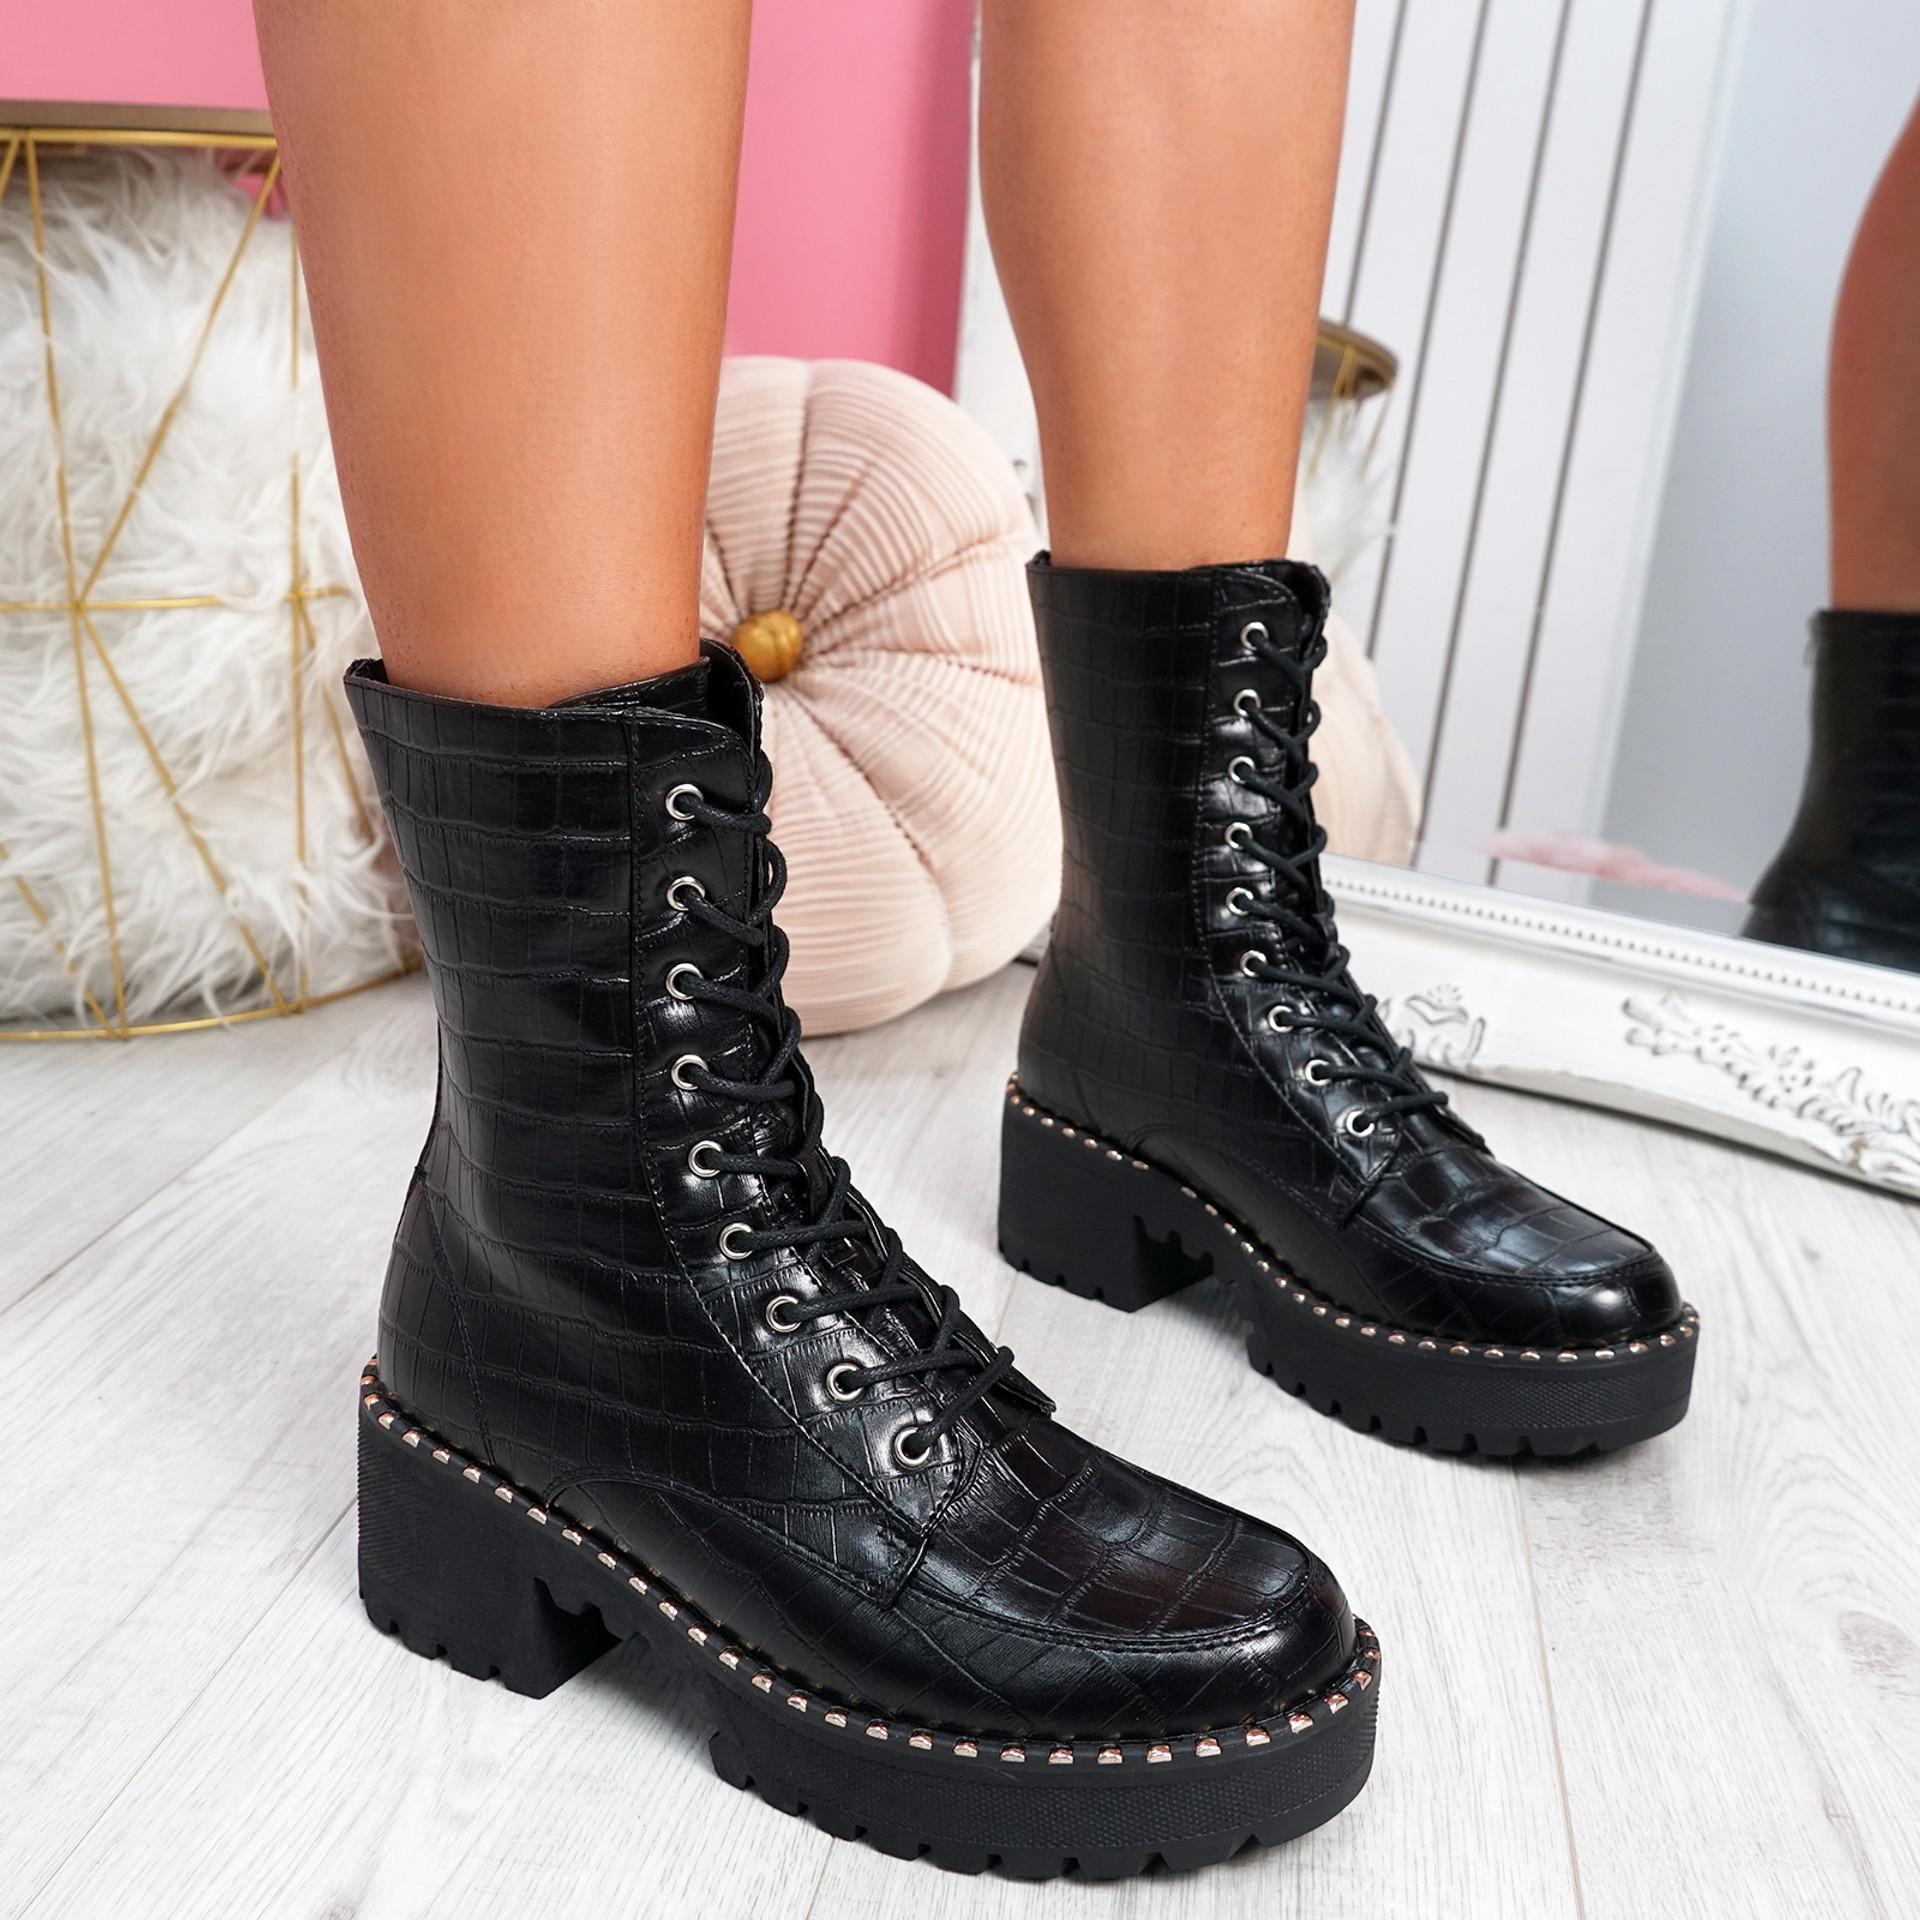 Lodda Black Croc High Top Biker Ankle Boots